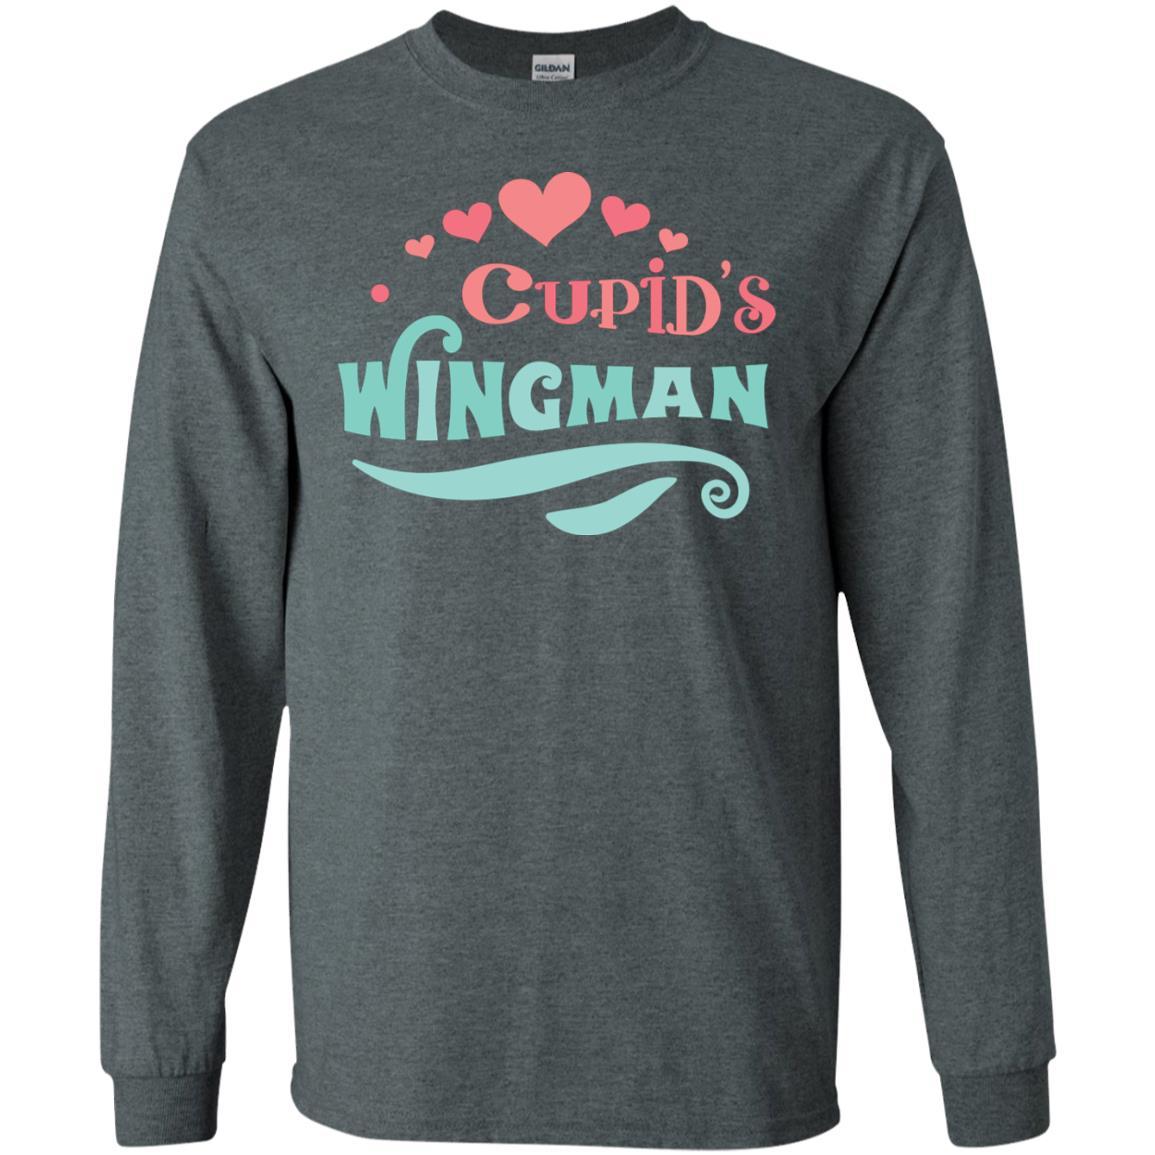 Cupid's Wingman Gildan LS Ultra Cotton T-Shirt